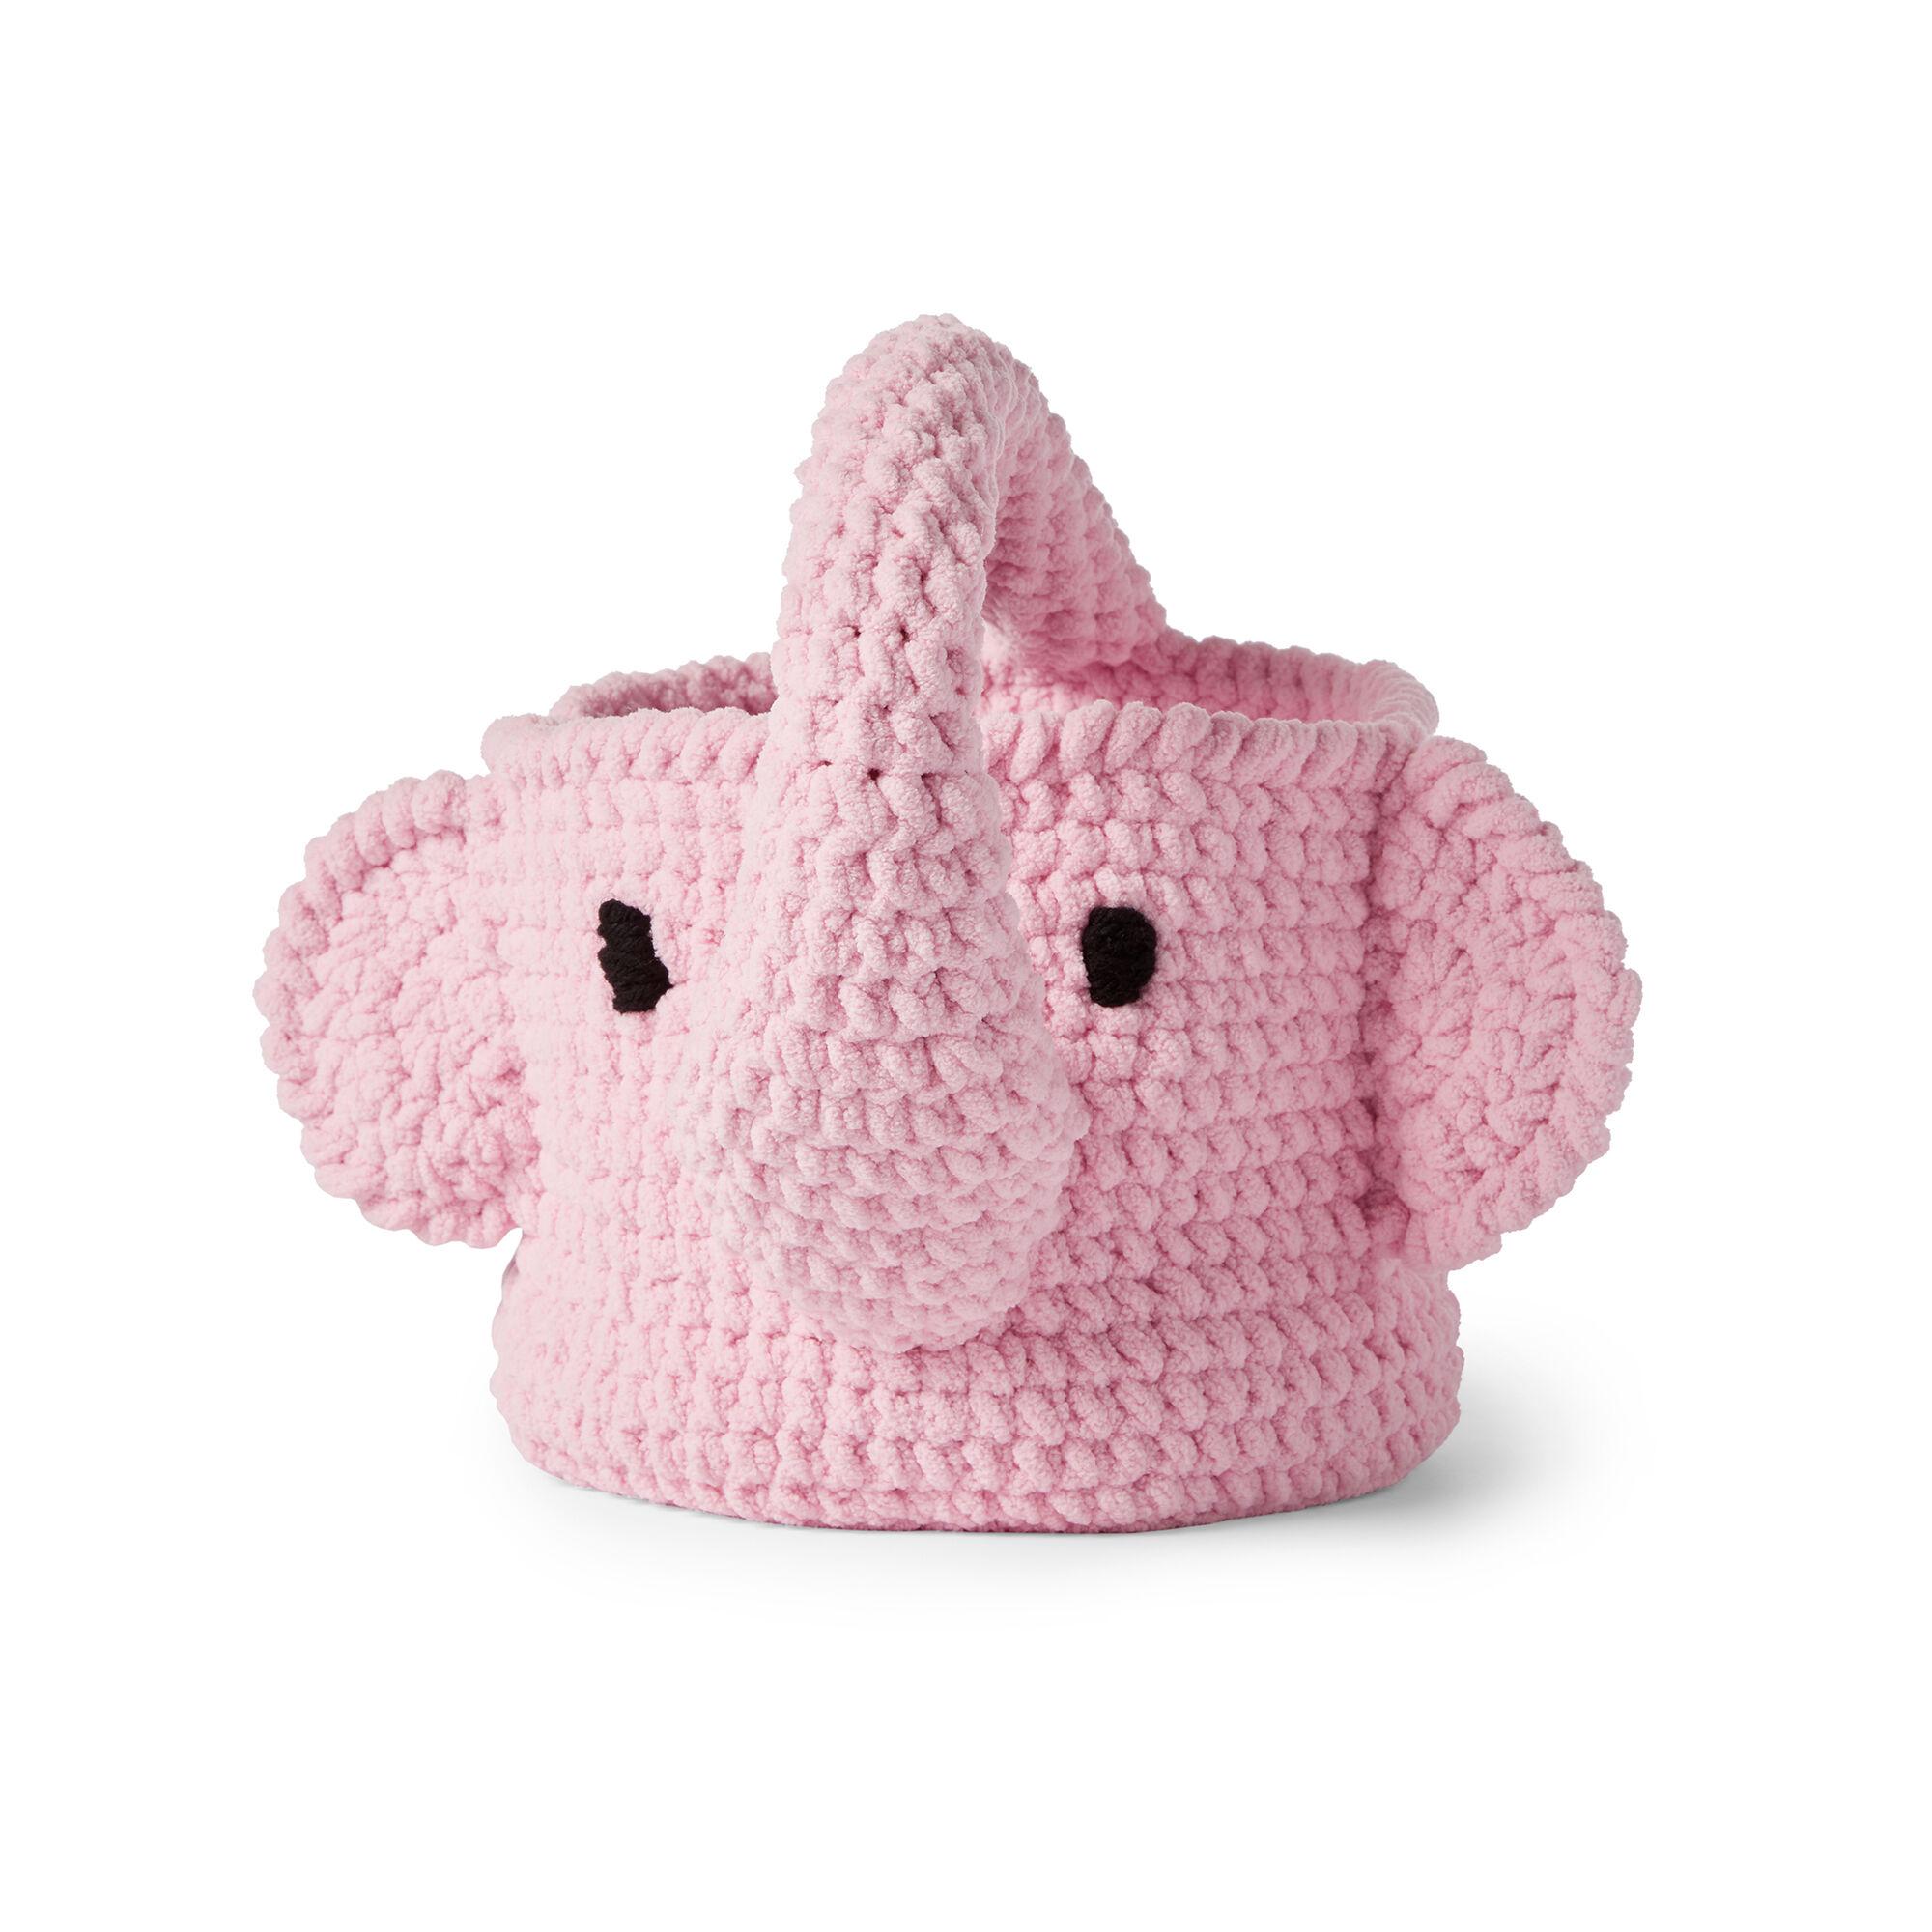 Pink crochet elephant pattern - Amigurumi Today | 2000x2000